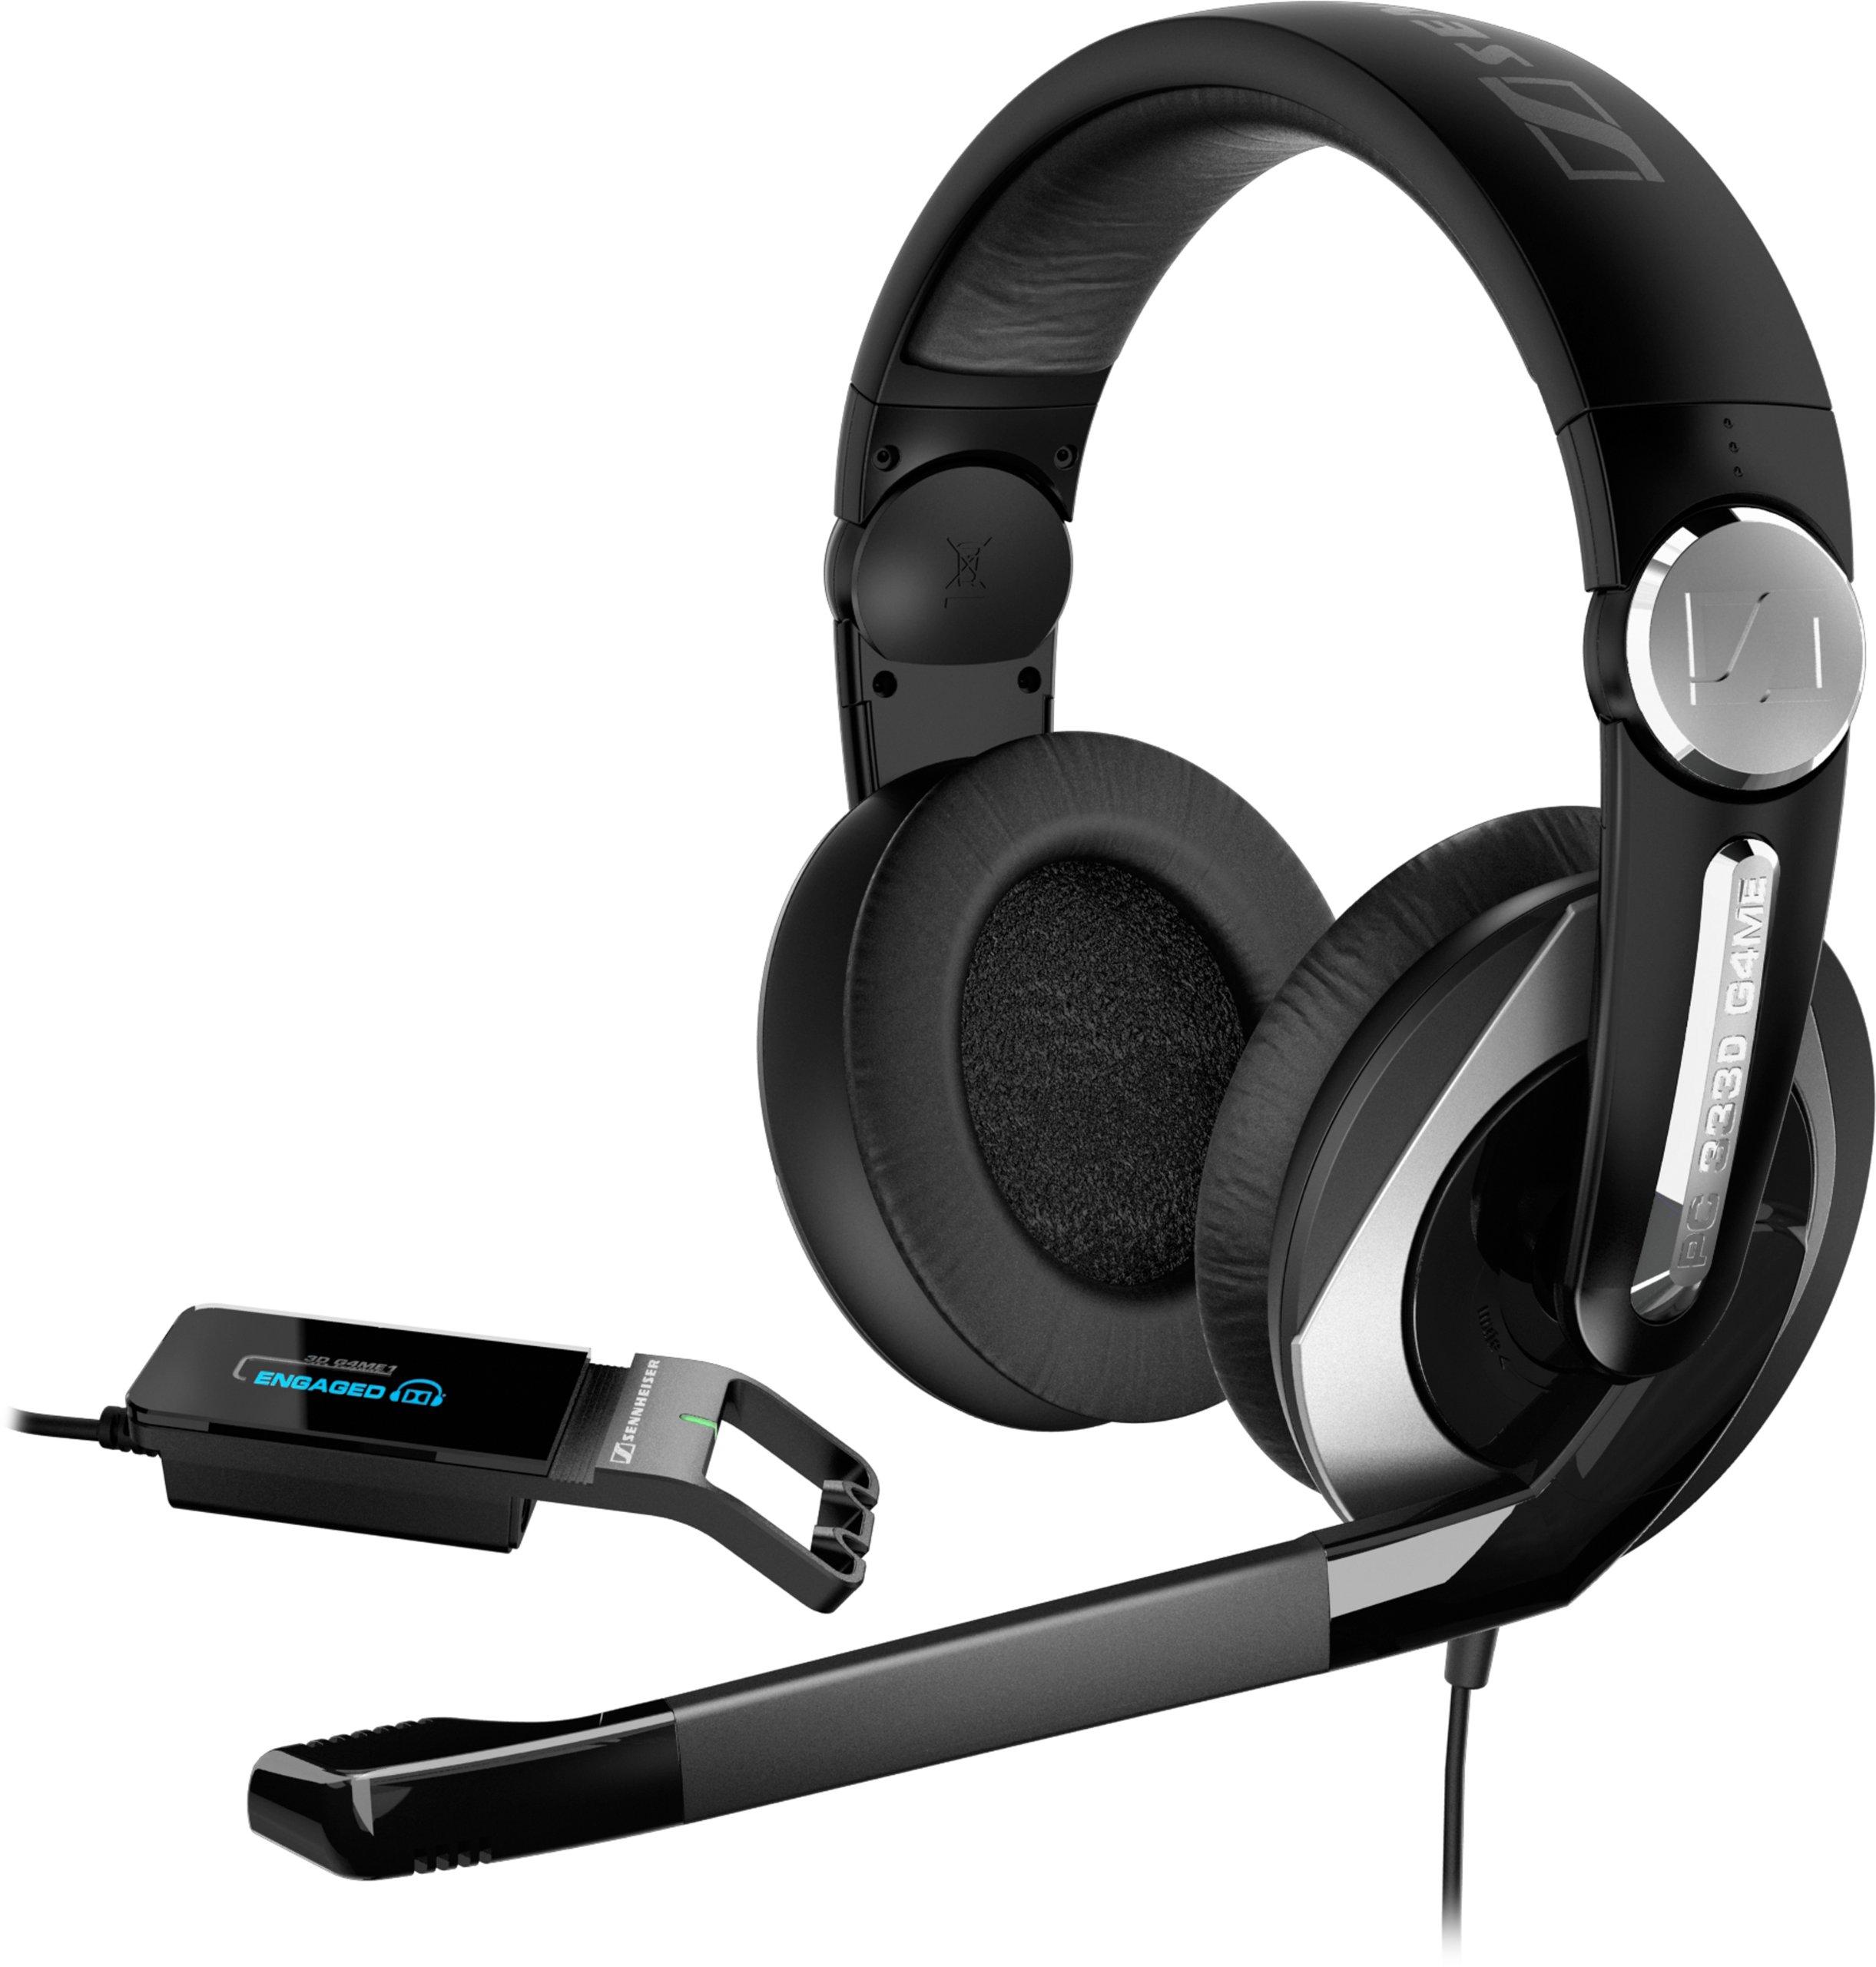 Sennheiser PC 333D Gaming Headset by Sennheiser (Image #3)